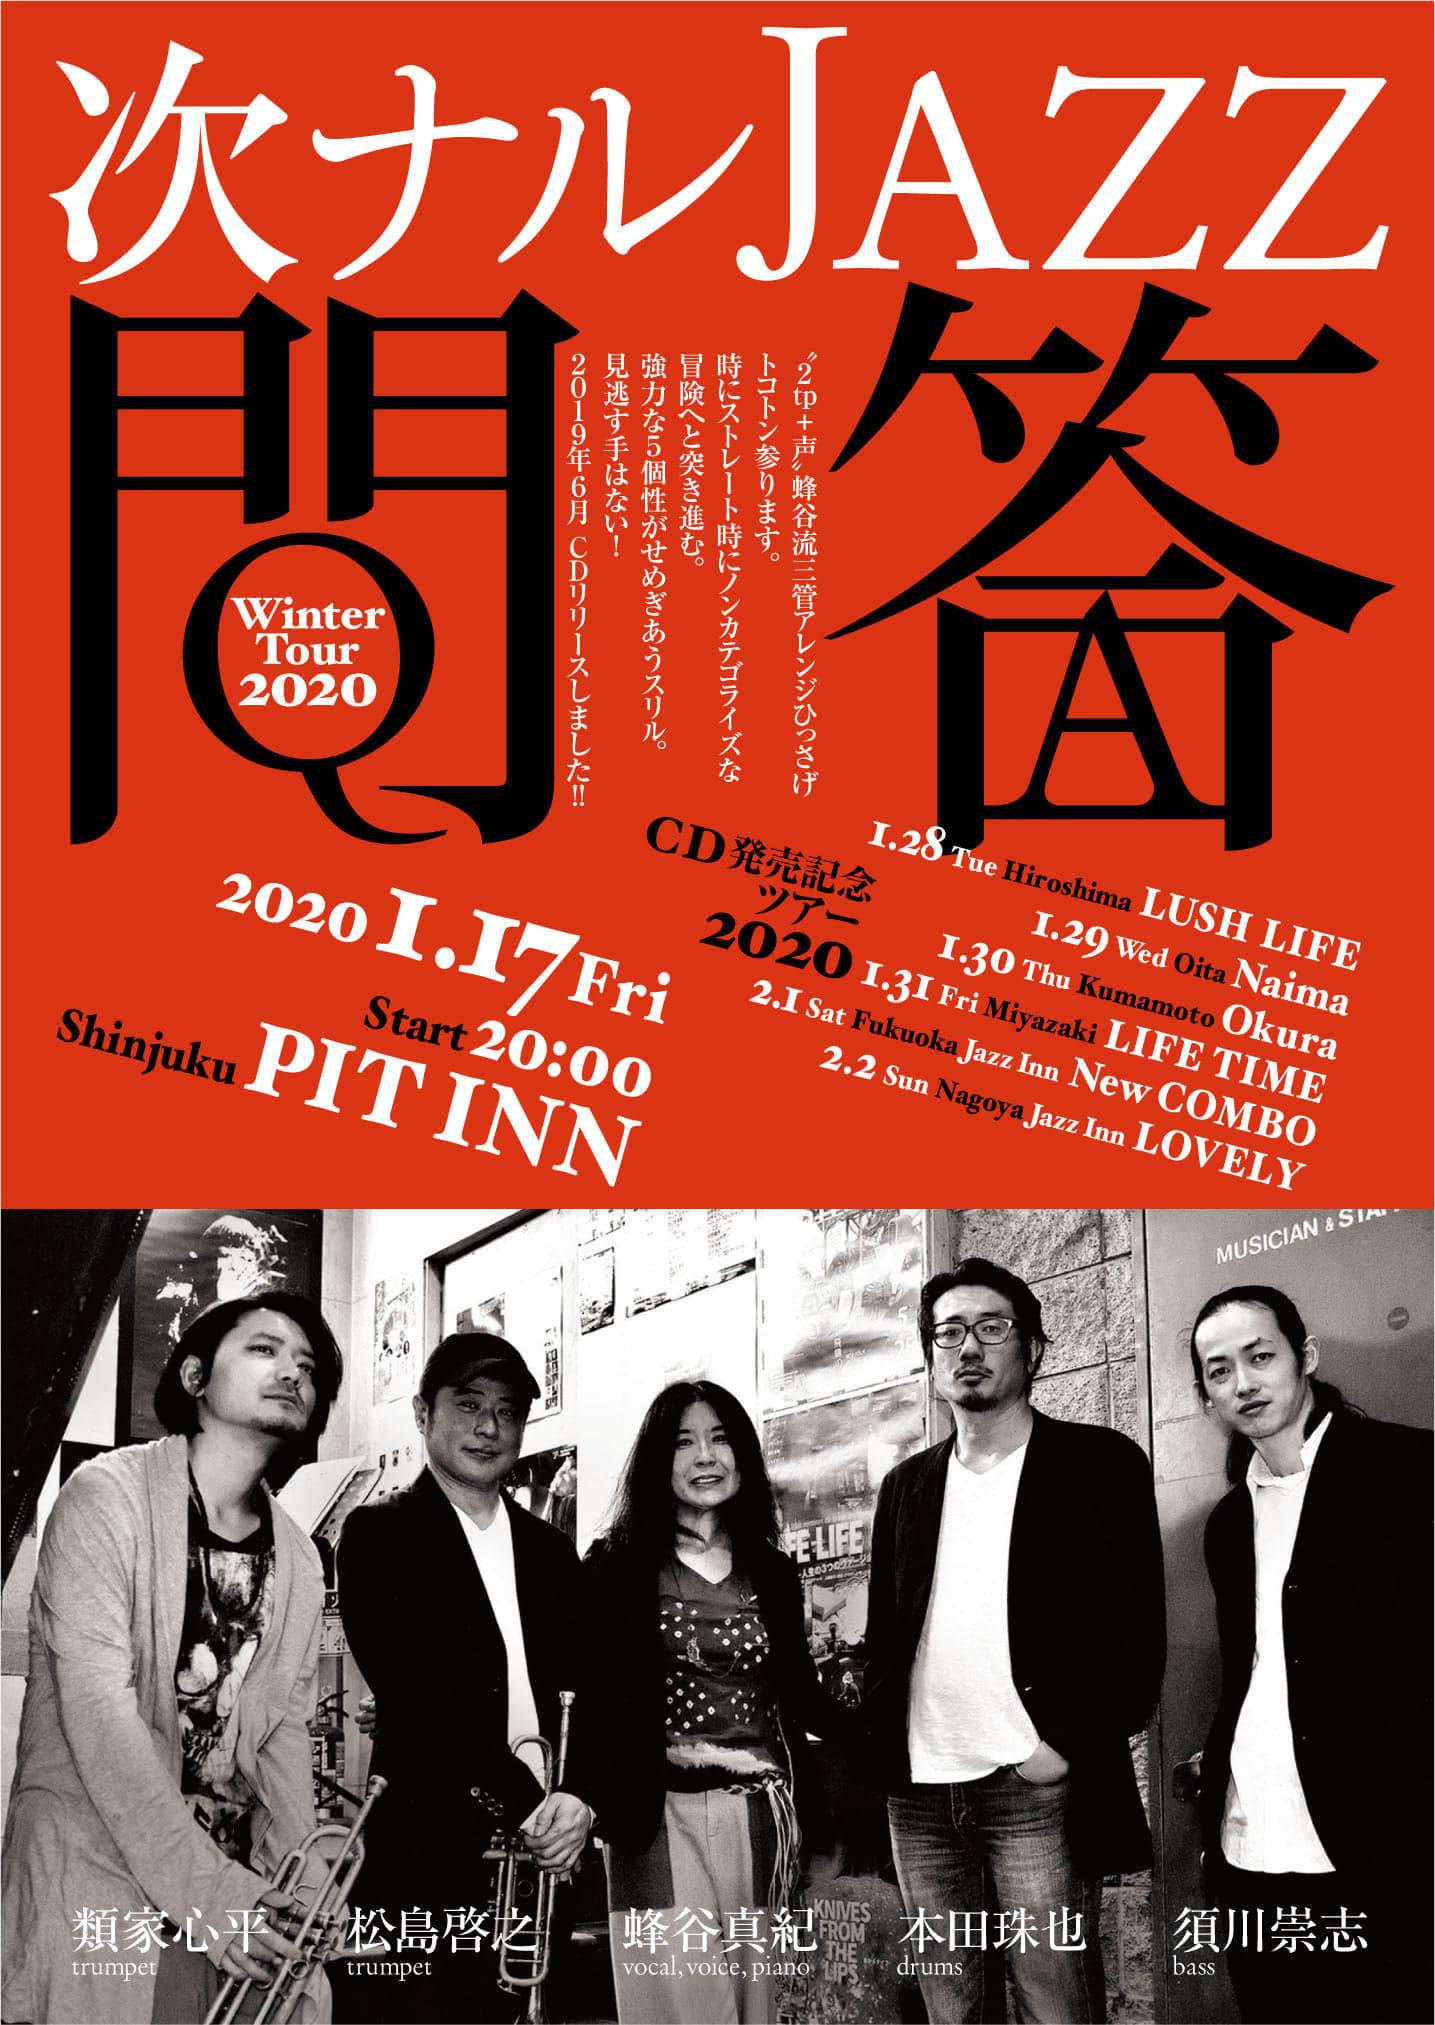 Maki Hachiya 2020:1月〜2月 live schedule_d0239981_14531338.jpg